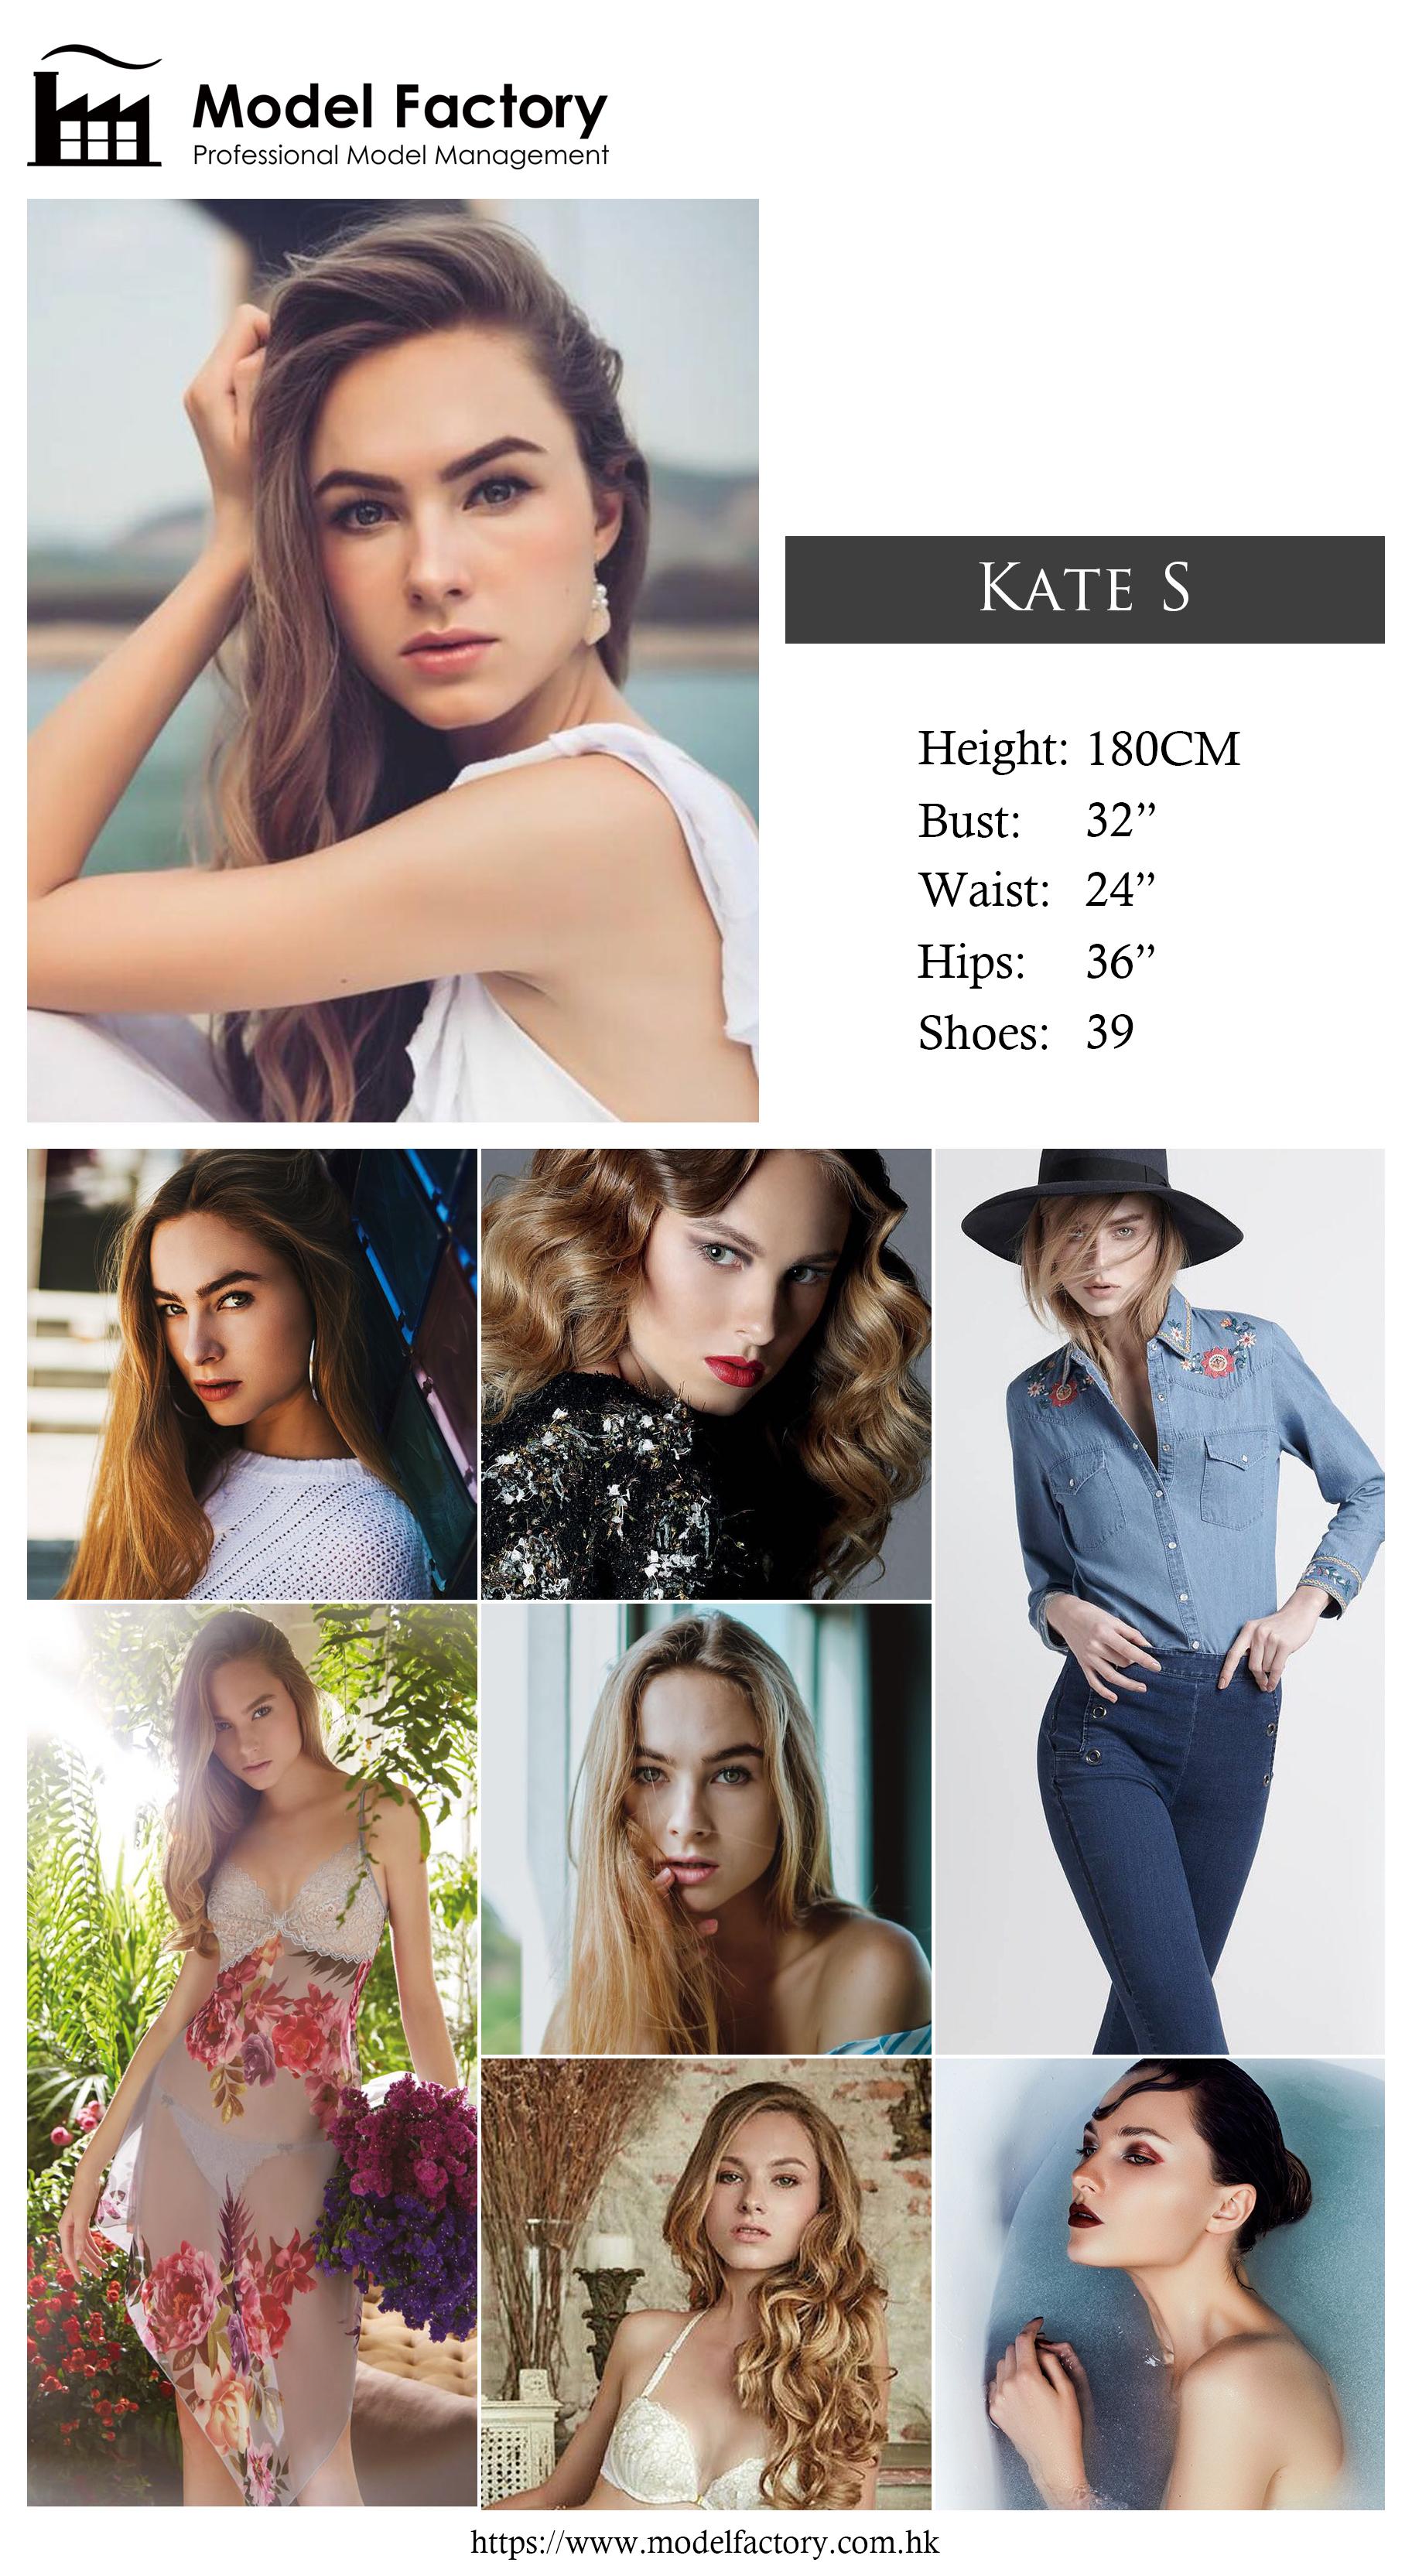 Model Factory Caucasian Female Model KateS